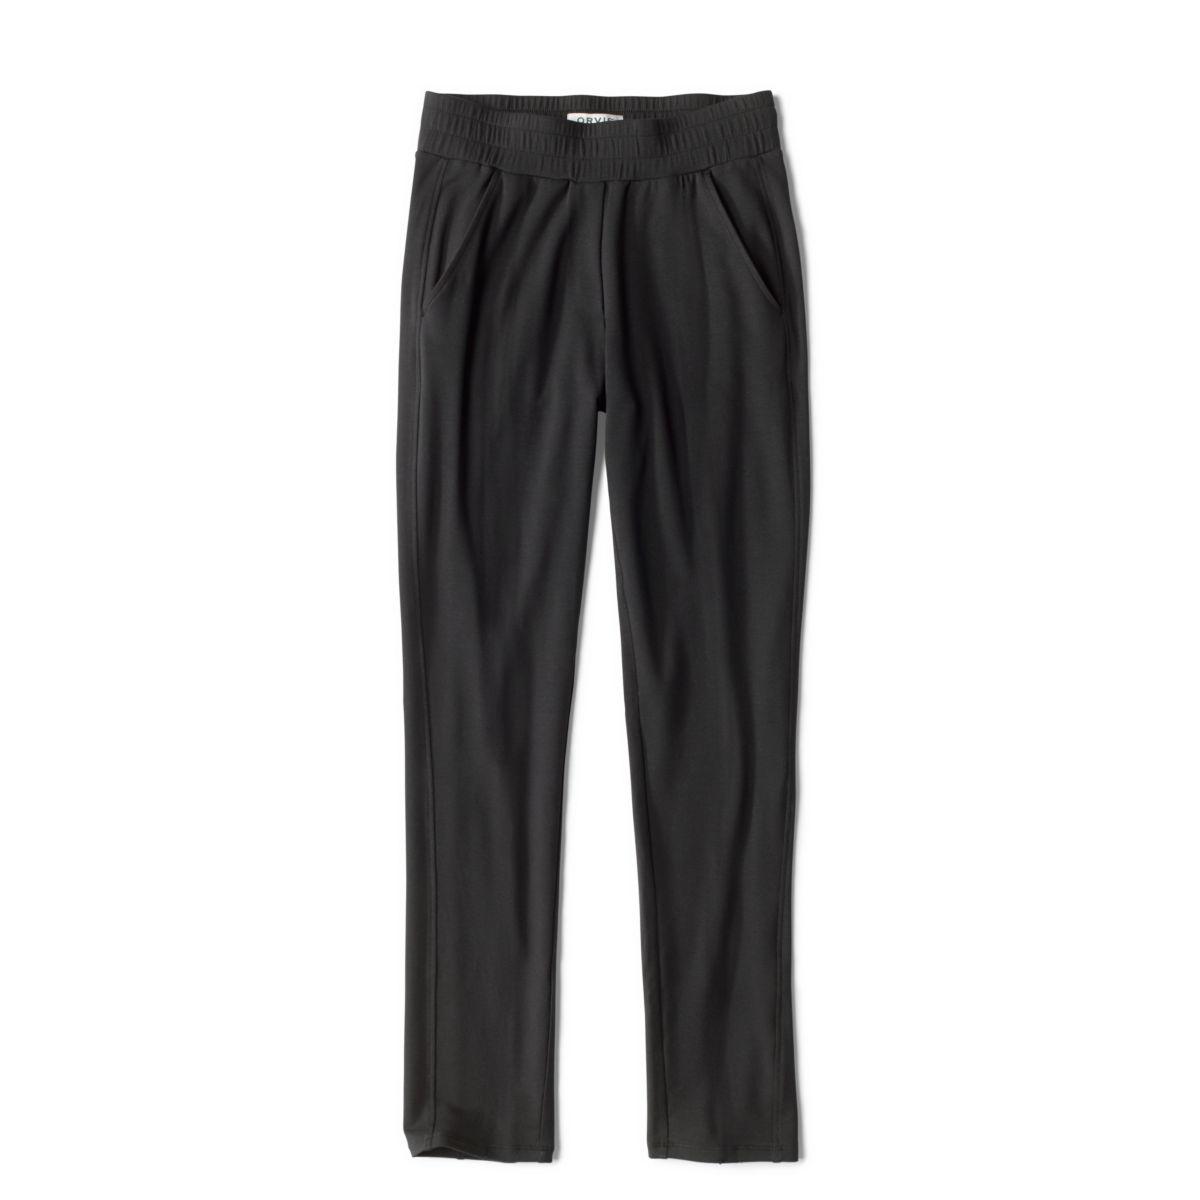 2-Mile Pants - BLACKimage number 0